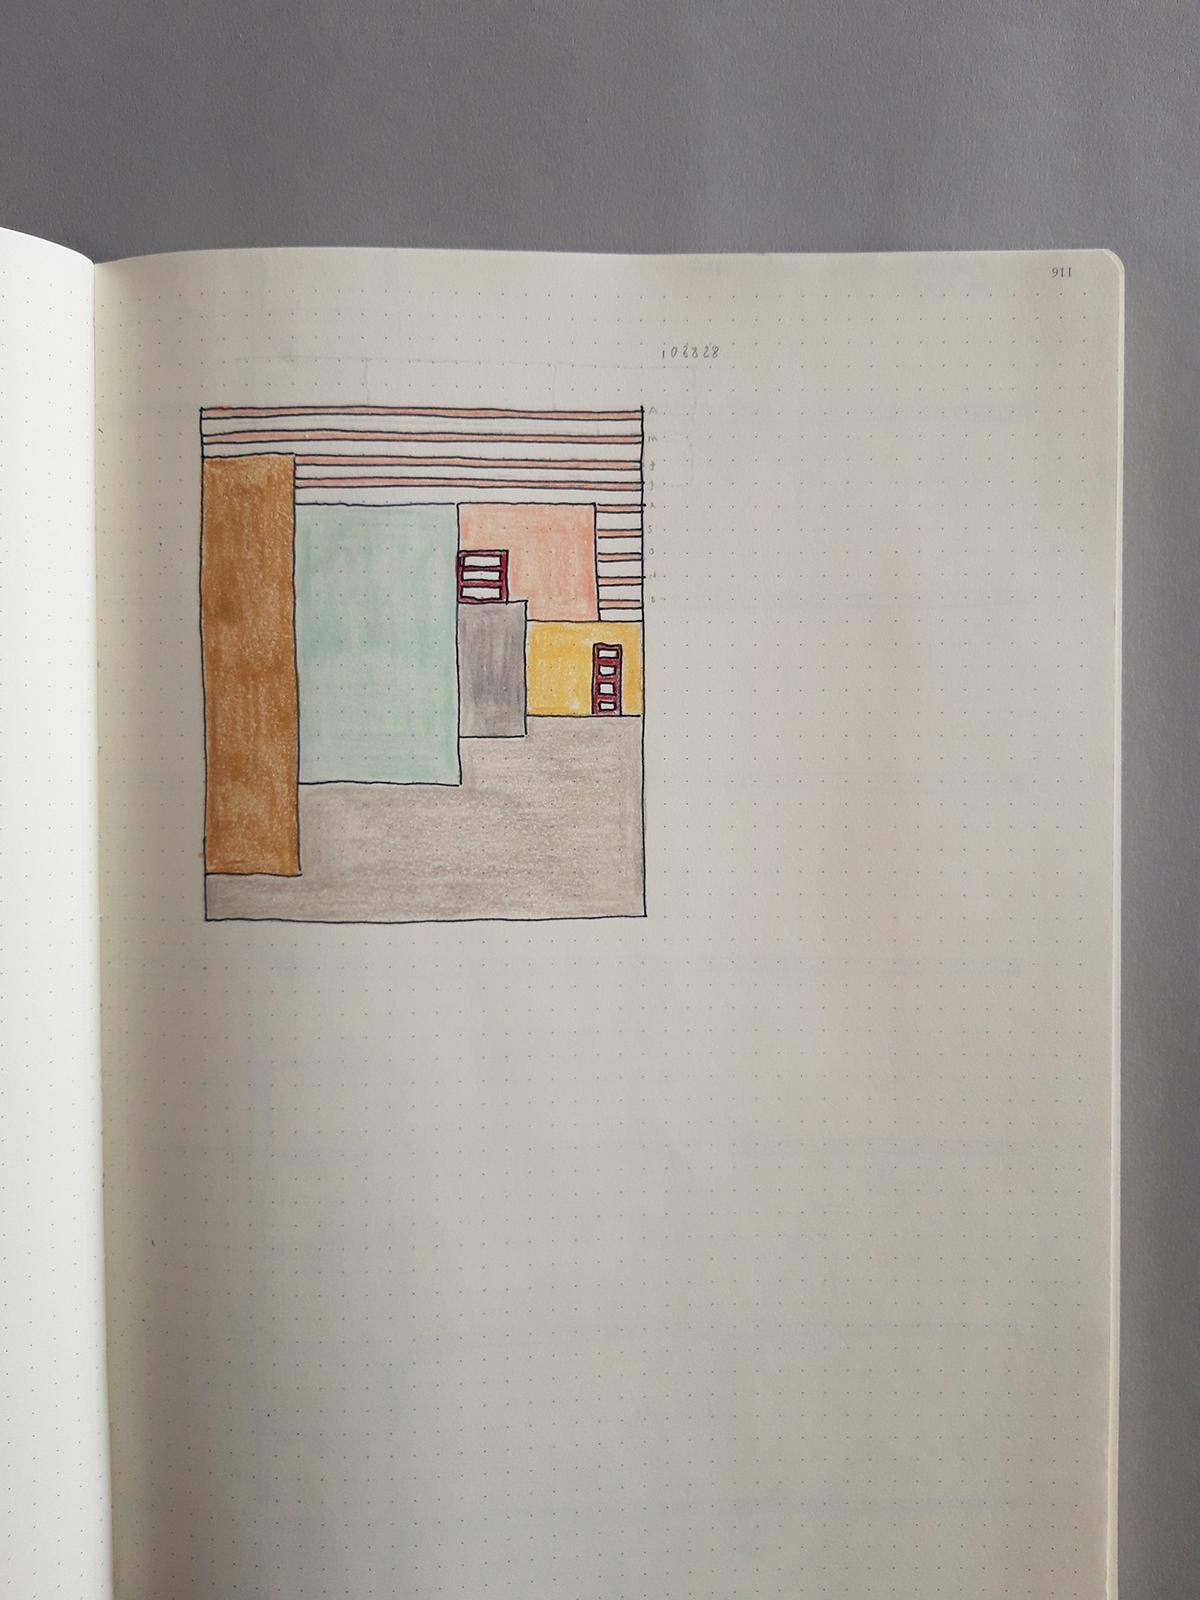 Eleanor_Pritchard_Fallingwater_drawing_2a.jpg